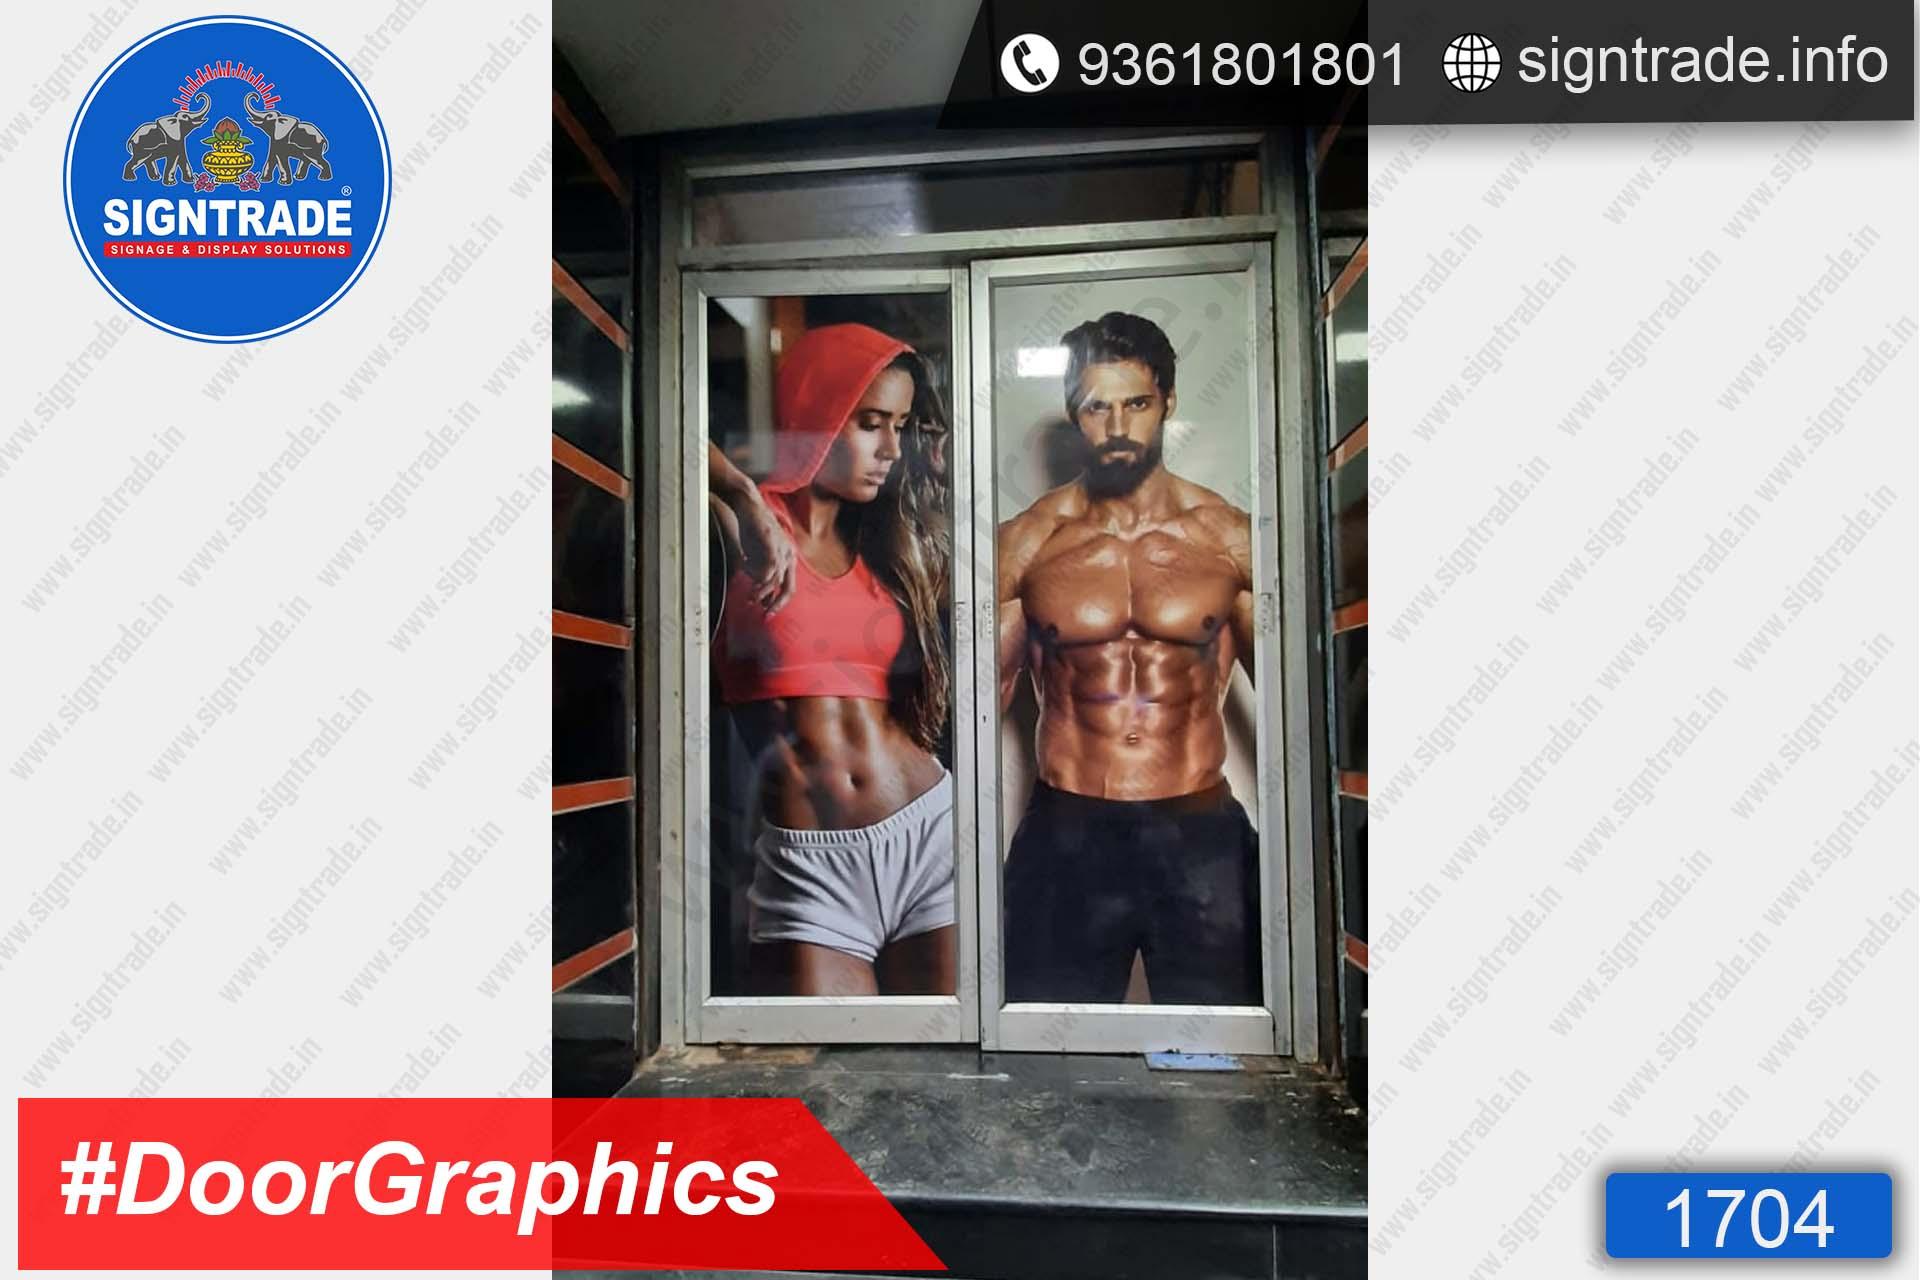 Body Focus Gym, Chennai - SIGNTRADE - Door Graphics, Vinyl Printing, Digital Printing Service in Chennai